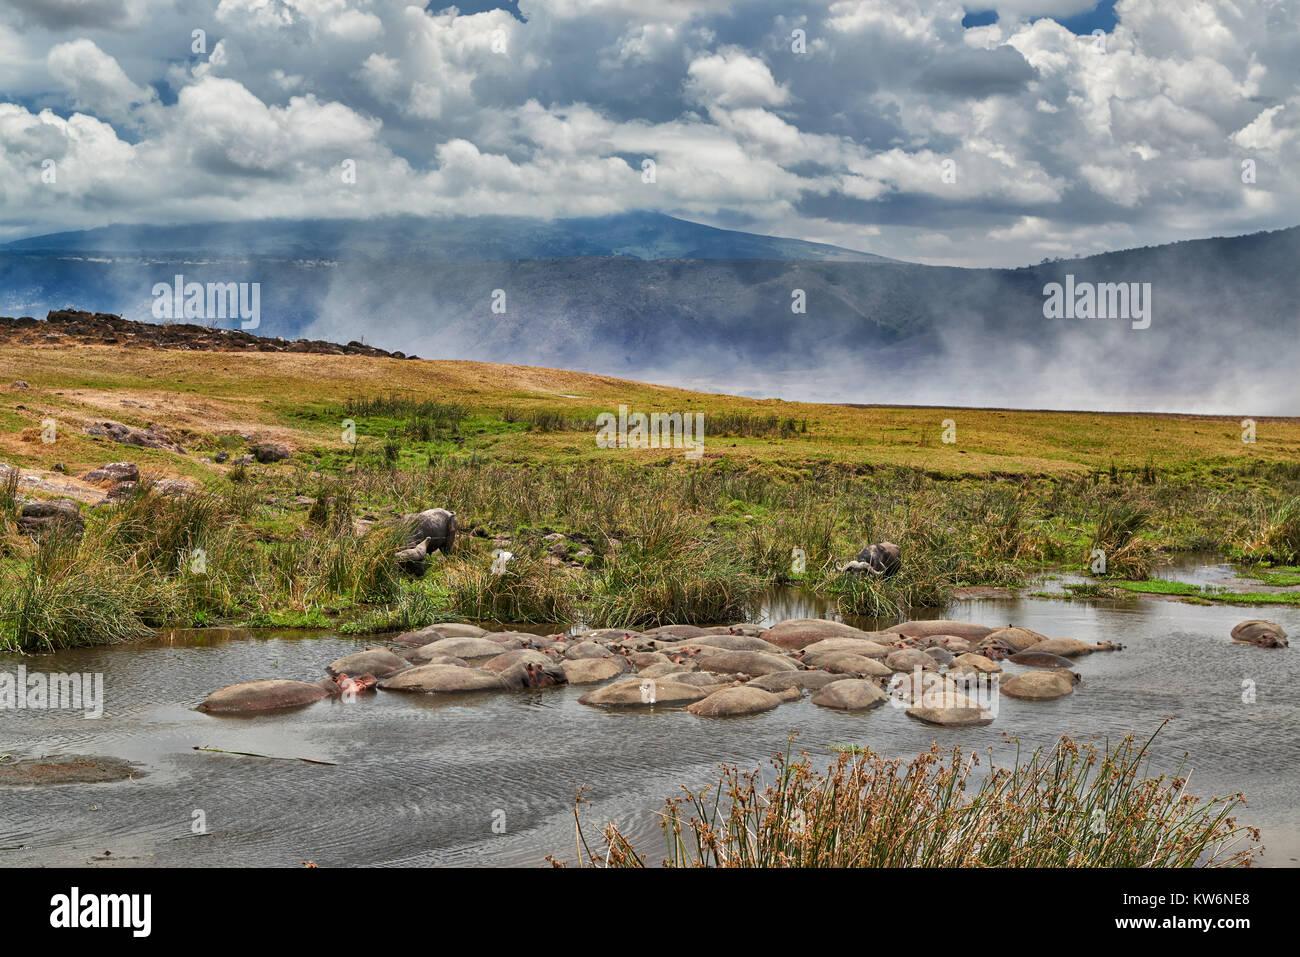 Hippopool in landscape of Ngorongoro Conservation Area, UNESCO world heritage site, Tanzania, Africa - Stock Image